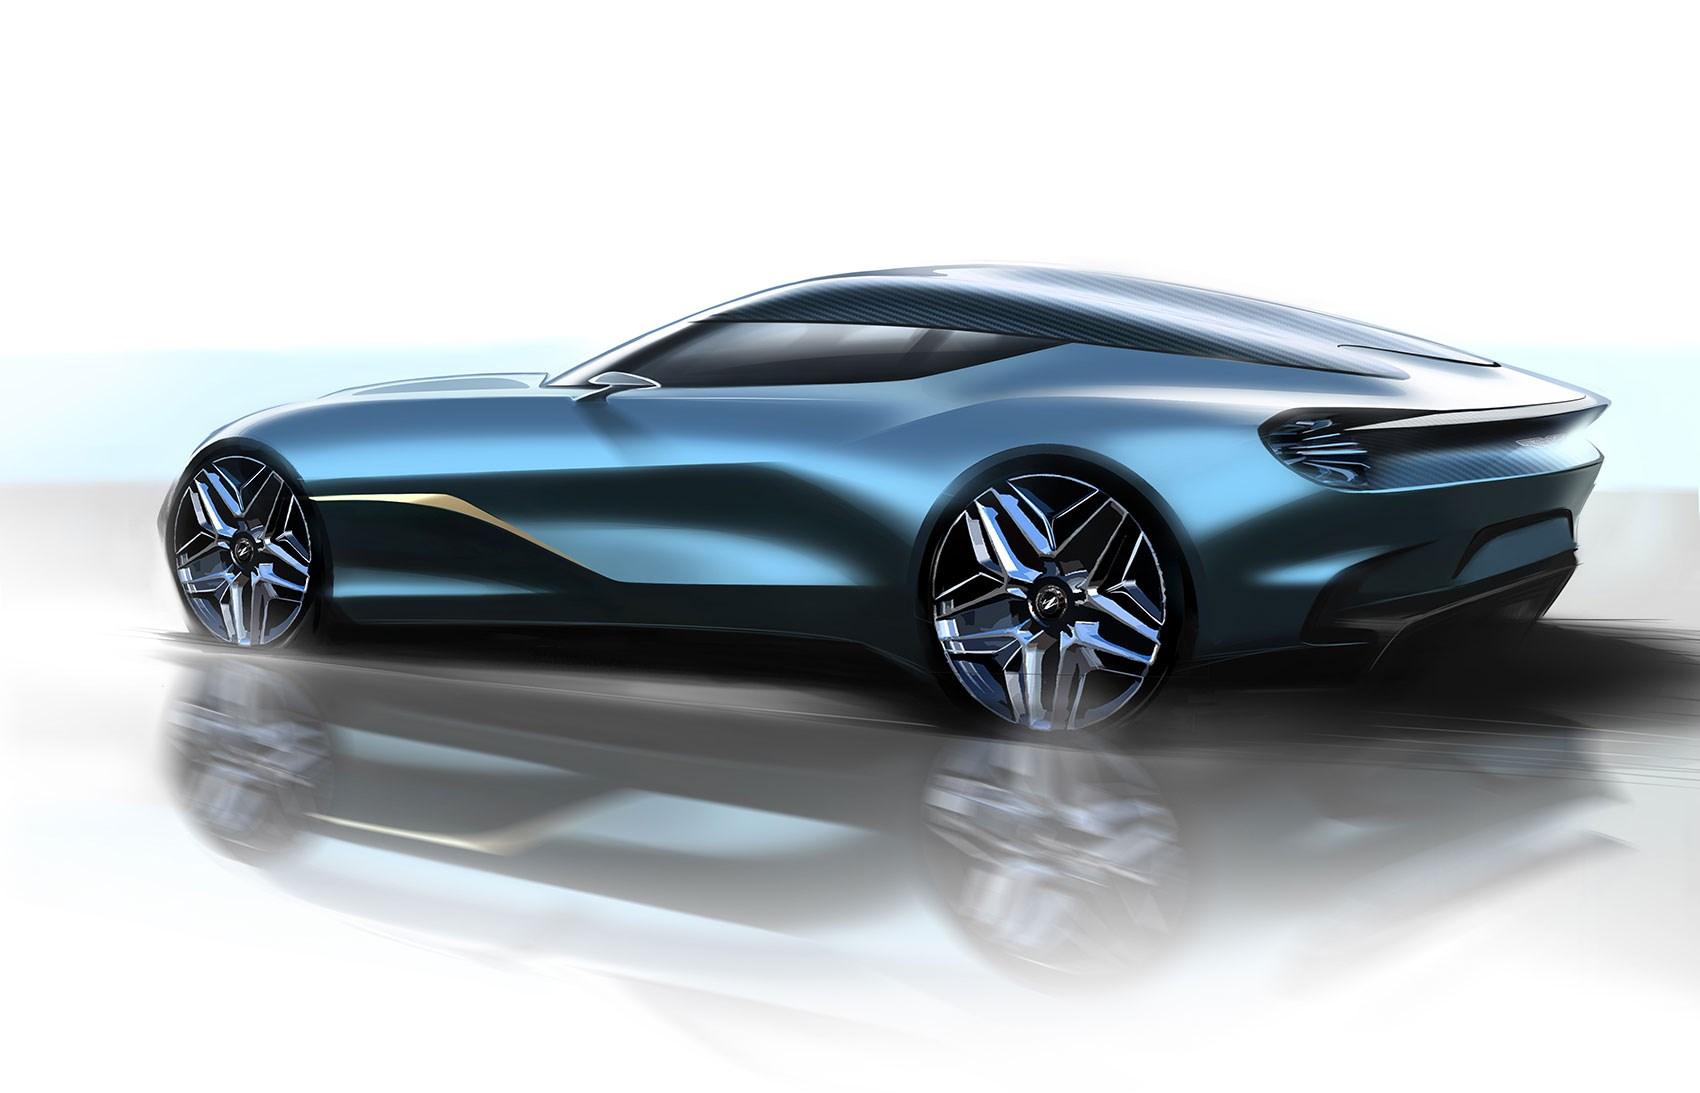 Aston Martin Dbs Gt Zagato And Db4 Gt Zagato Revealed Car Magazine